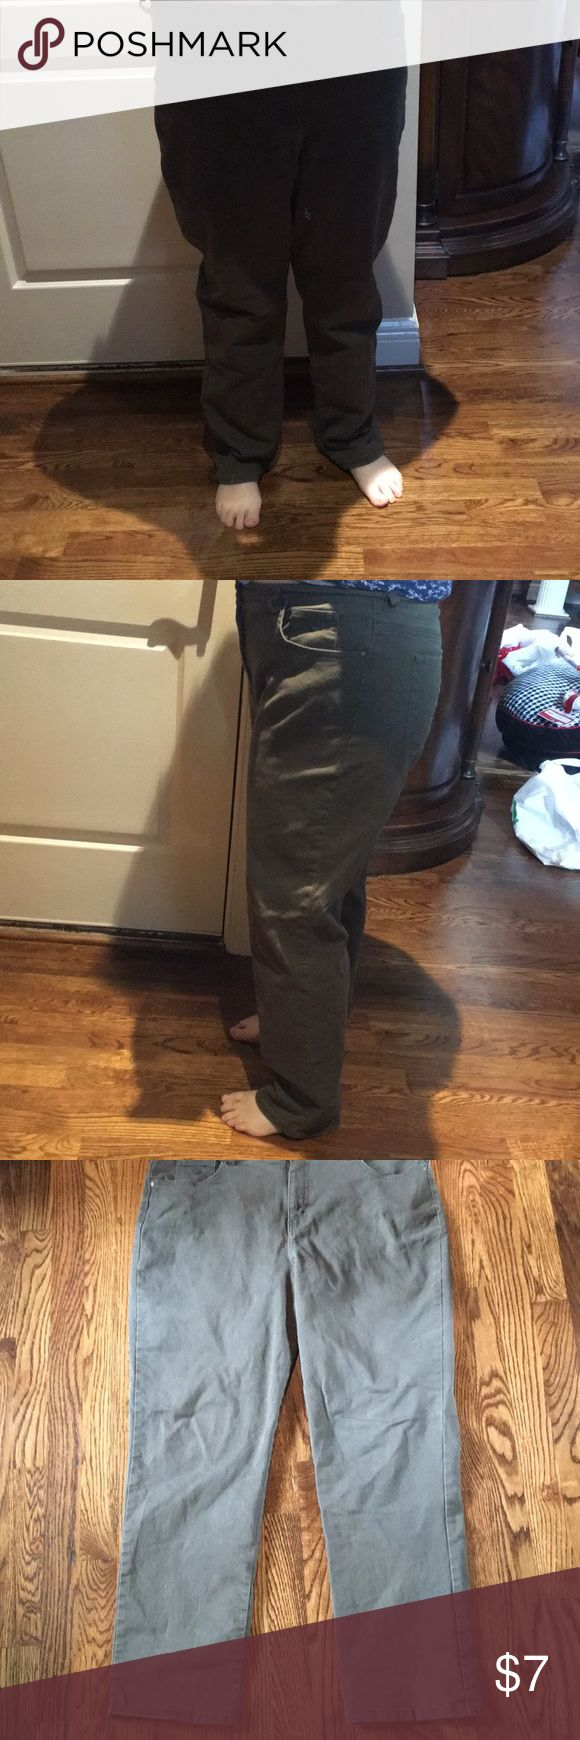 Gloria Size 16.  Stretch jeans 👖 green color Gloria Size 16.  Stretch jeans 👖 green color.  I have worn them.  But have a lot of life left in them.   Called Amanda Jeans. Gloria Vanderbilt Jeans Boot Cut